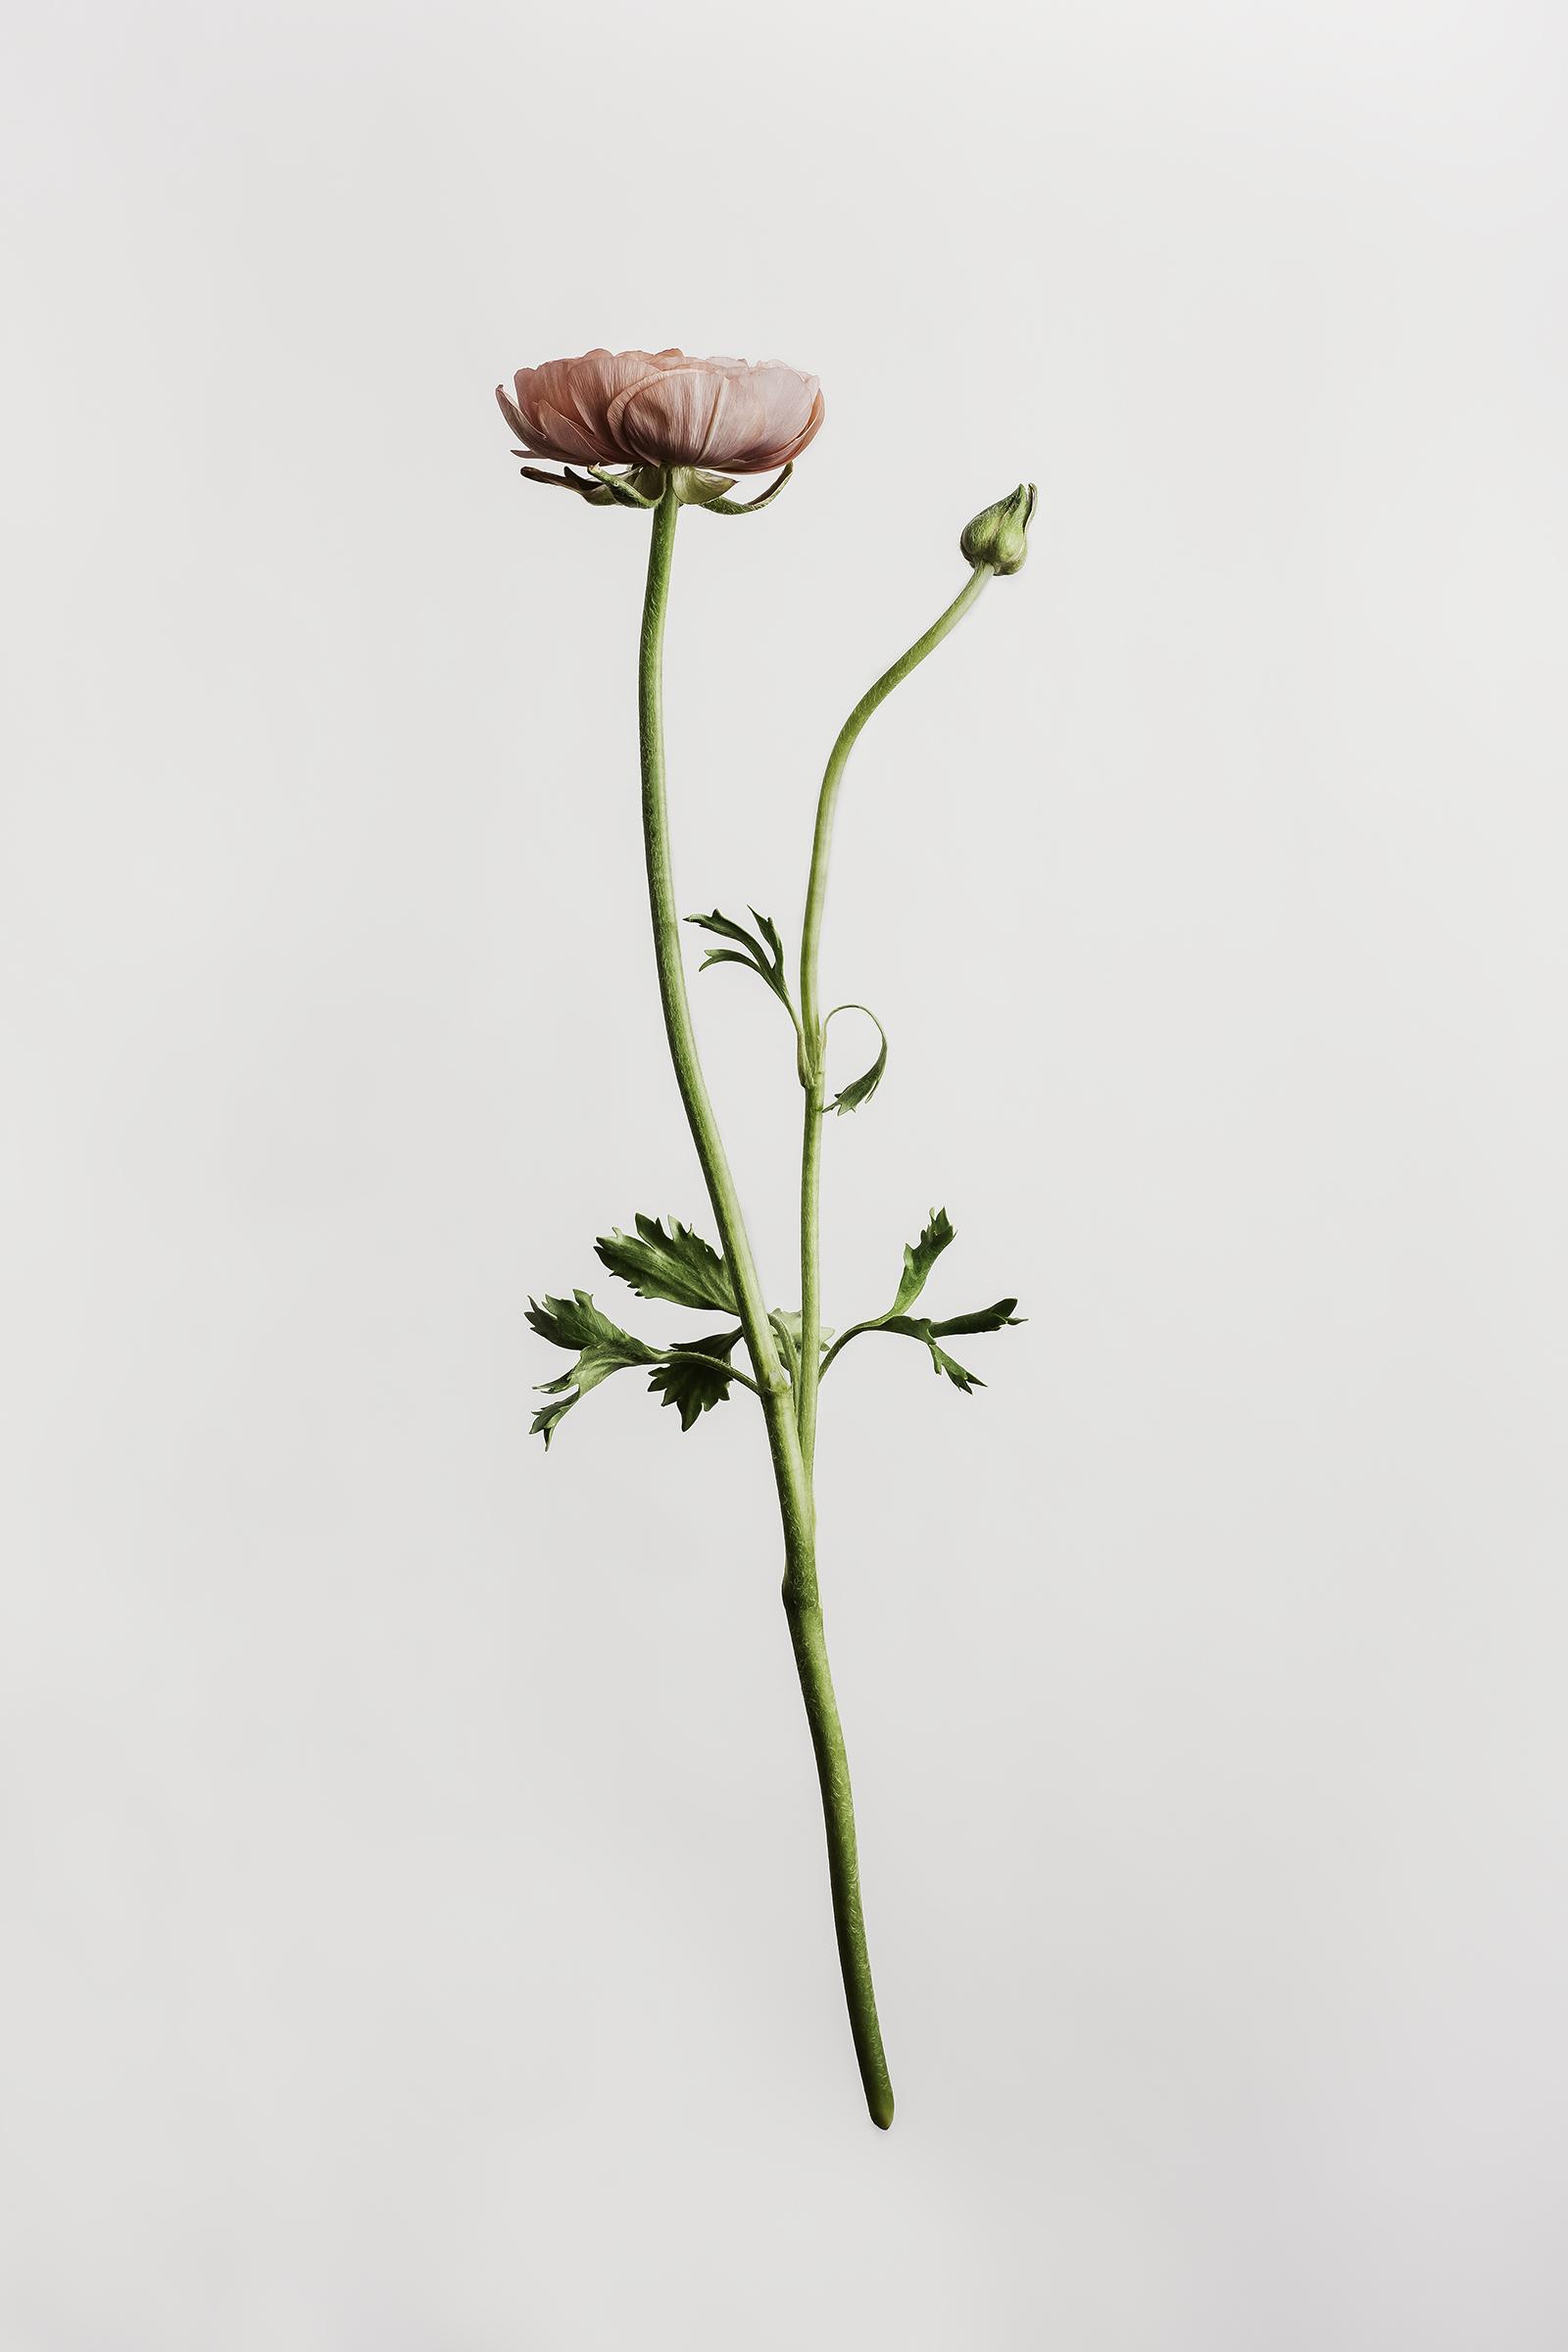 Ranunculus - Buttercup